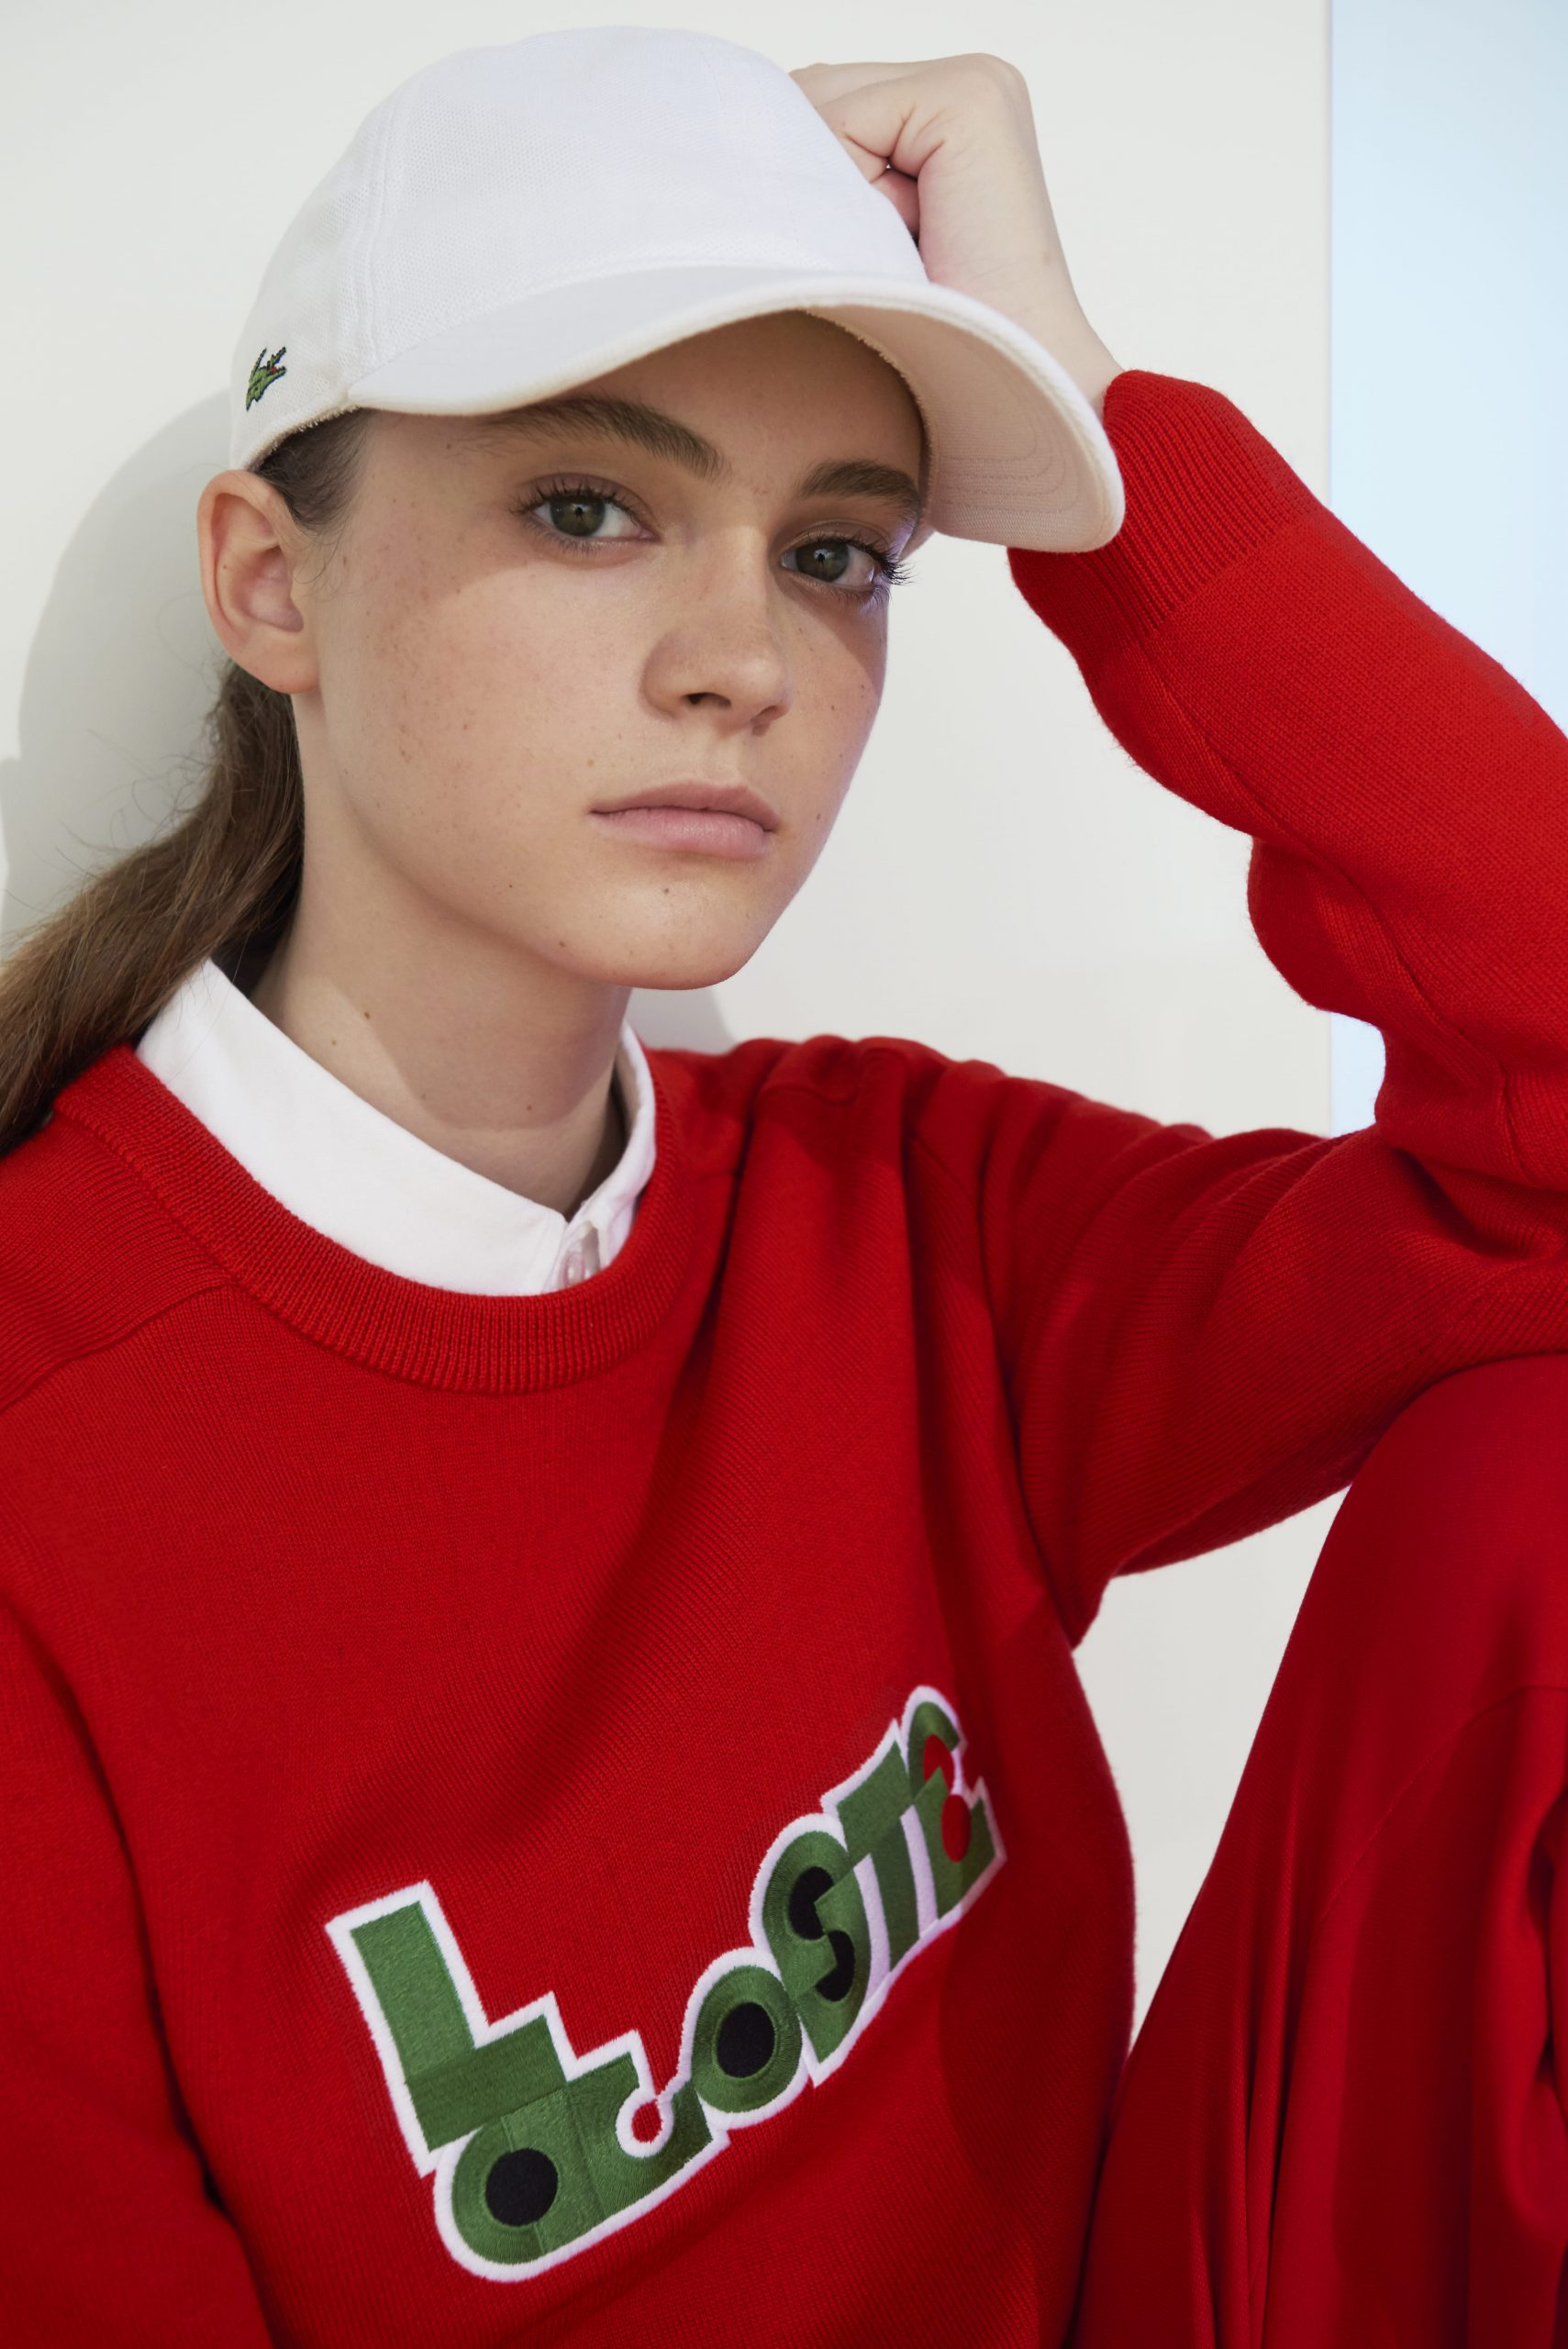 057cf31eb50 Lacoste X MM (Paris) FW17 Vanity Teen Menswear Magazine (16 ...